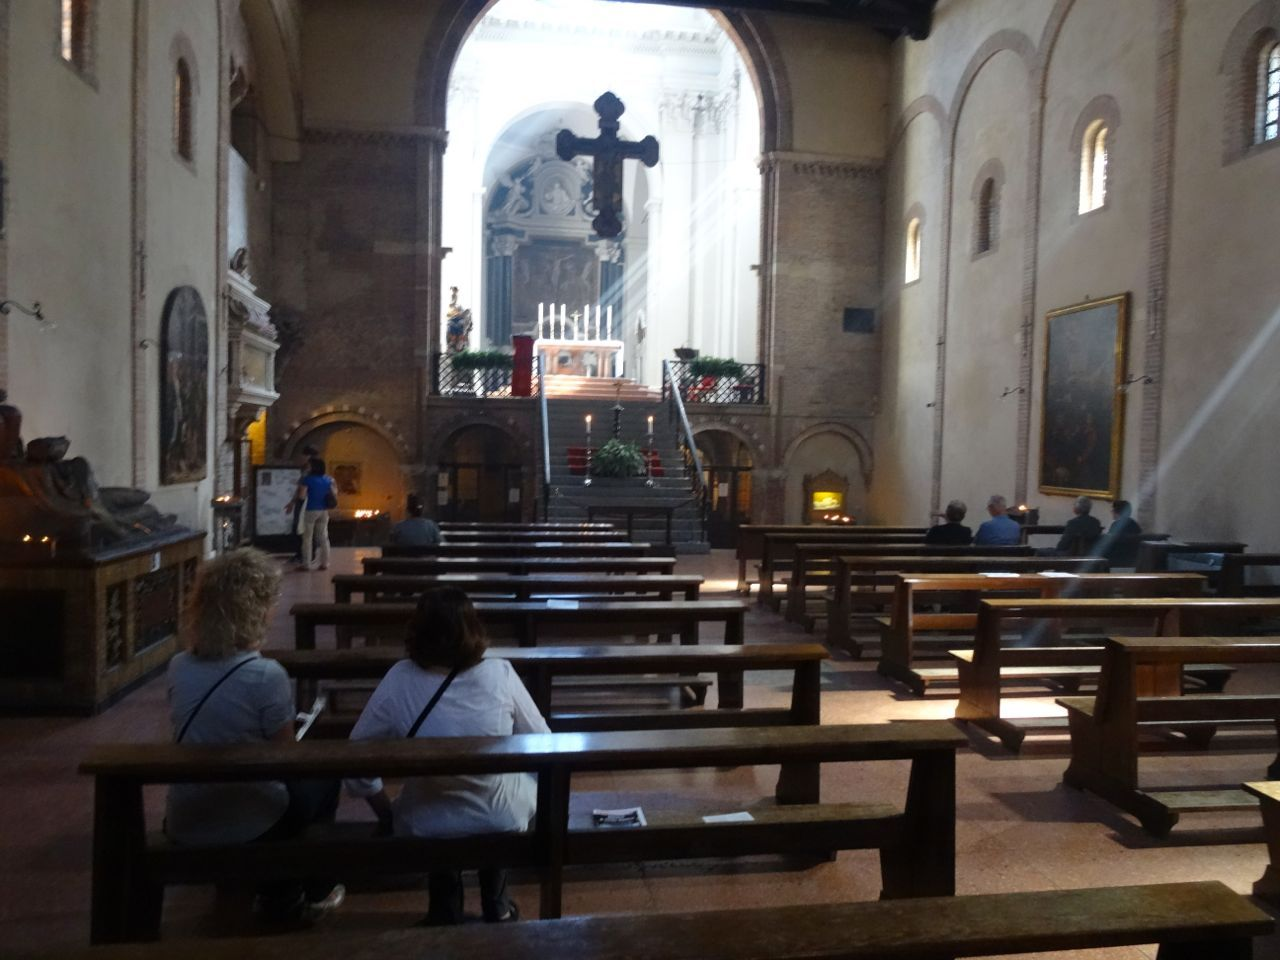 Santo Stefano: A Bologna landmark